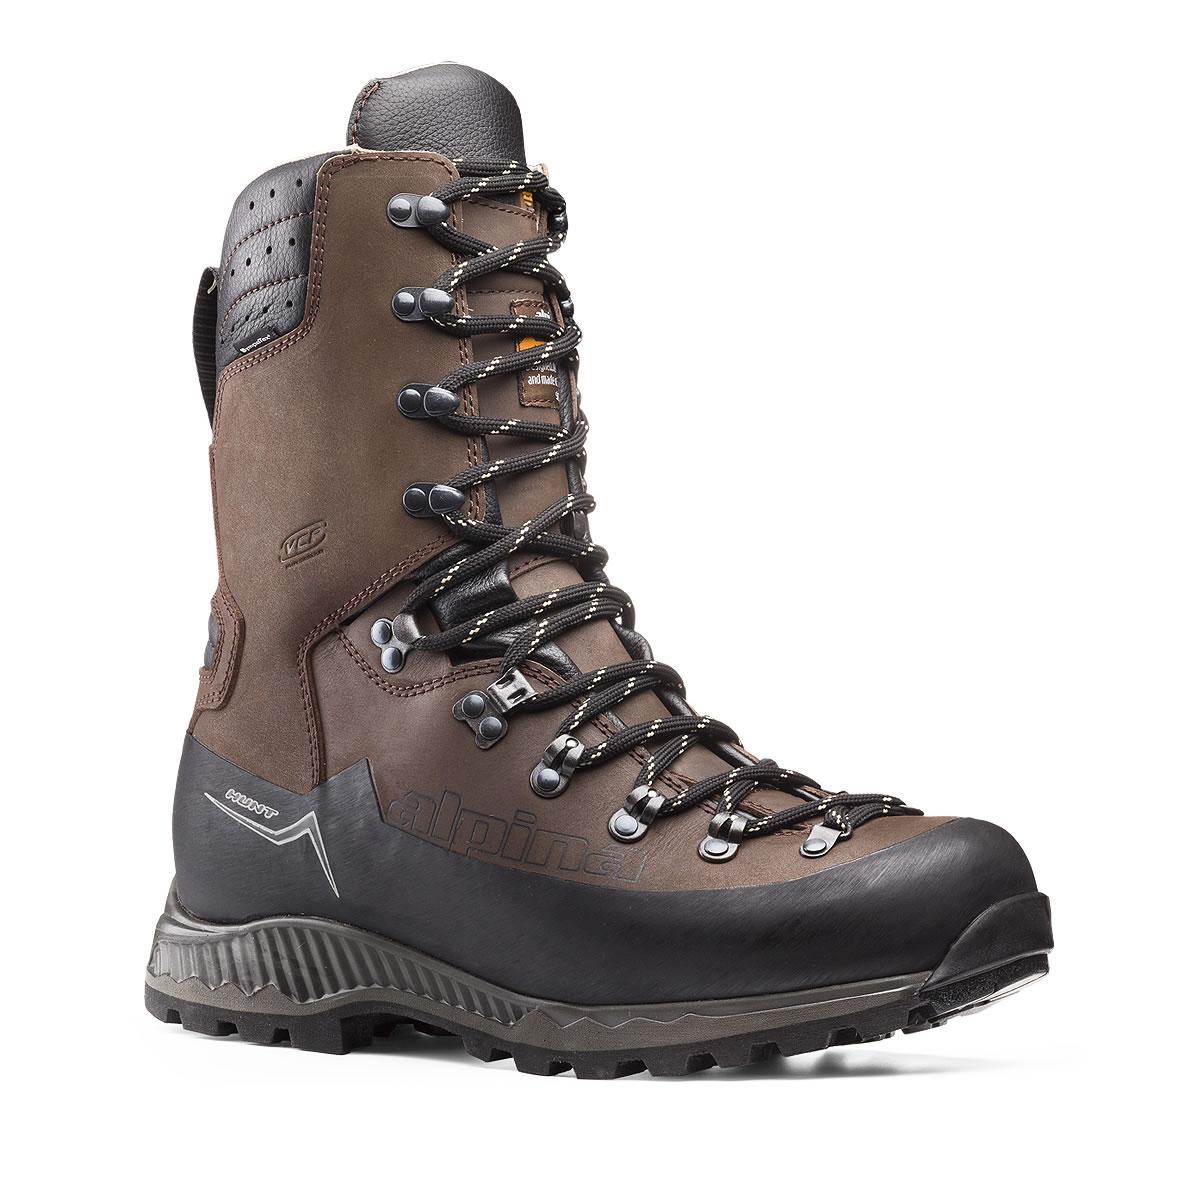 83e0b608720 Footwear. Highland Industrial Supplies Ltd UK